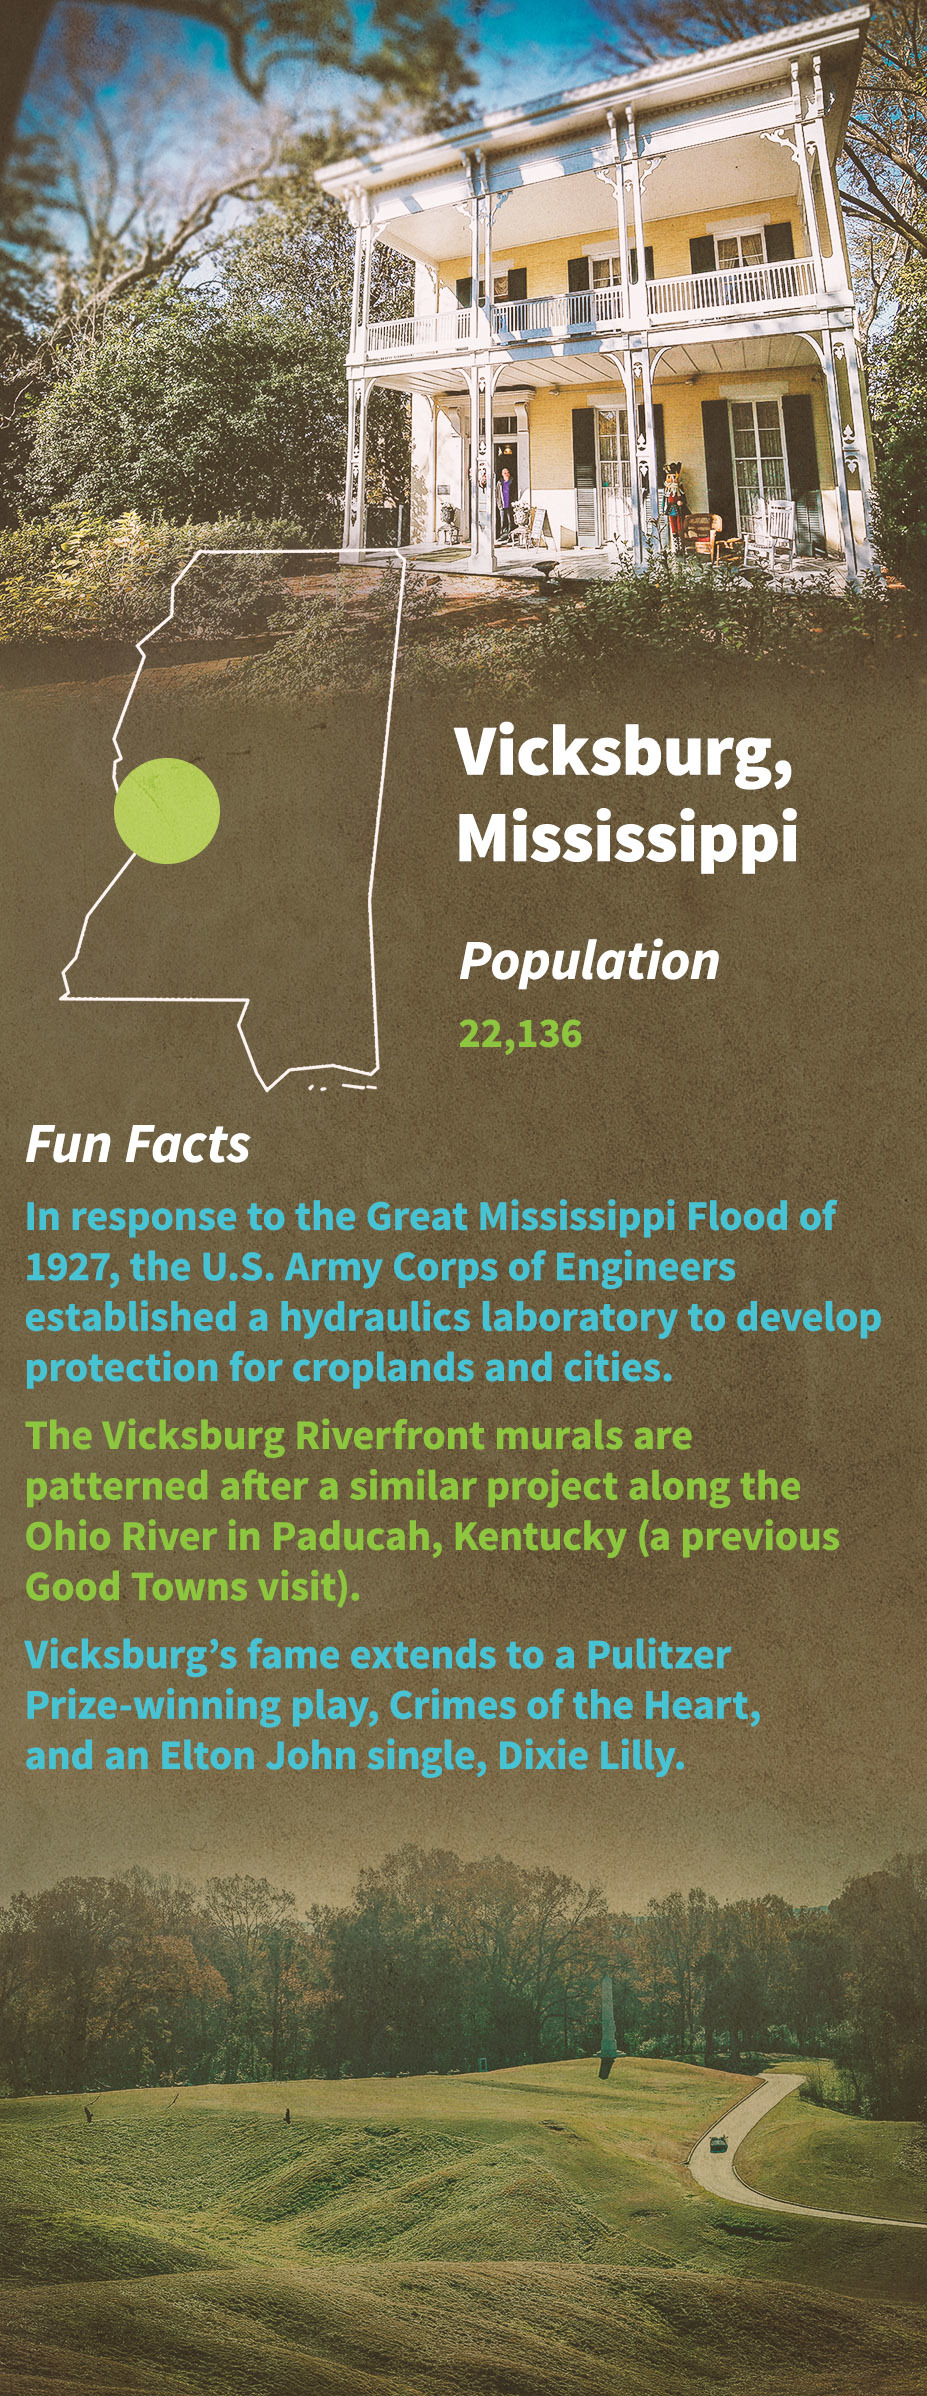 Vicksburg Fun Facts